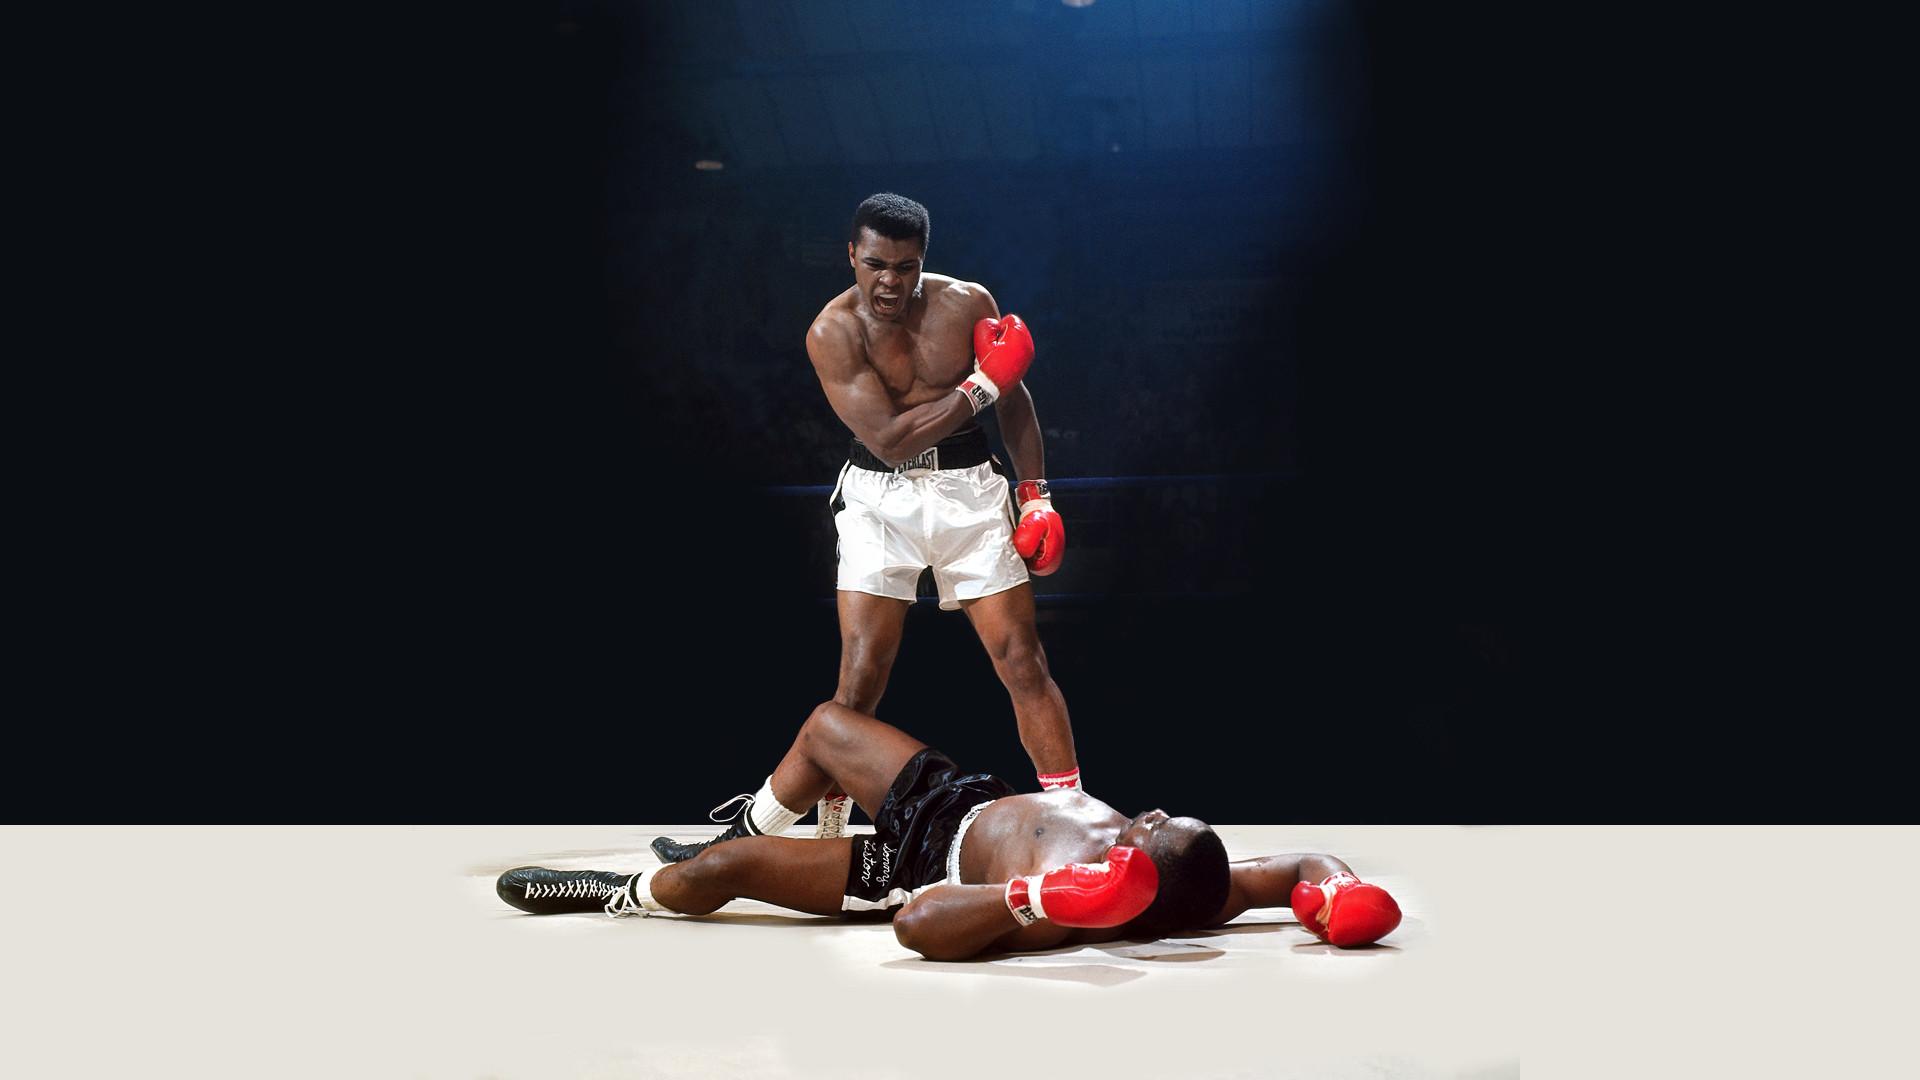 Boxing Full HD Wallpaper